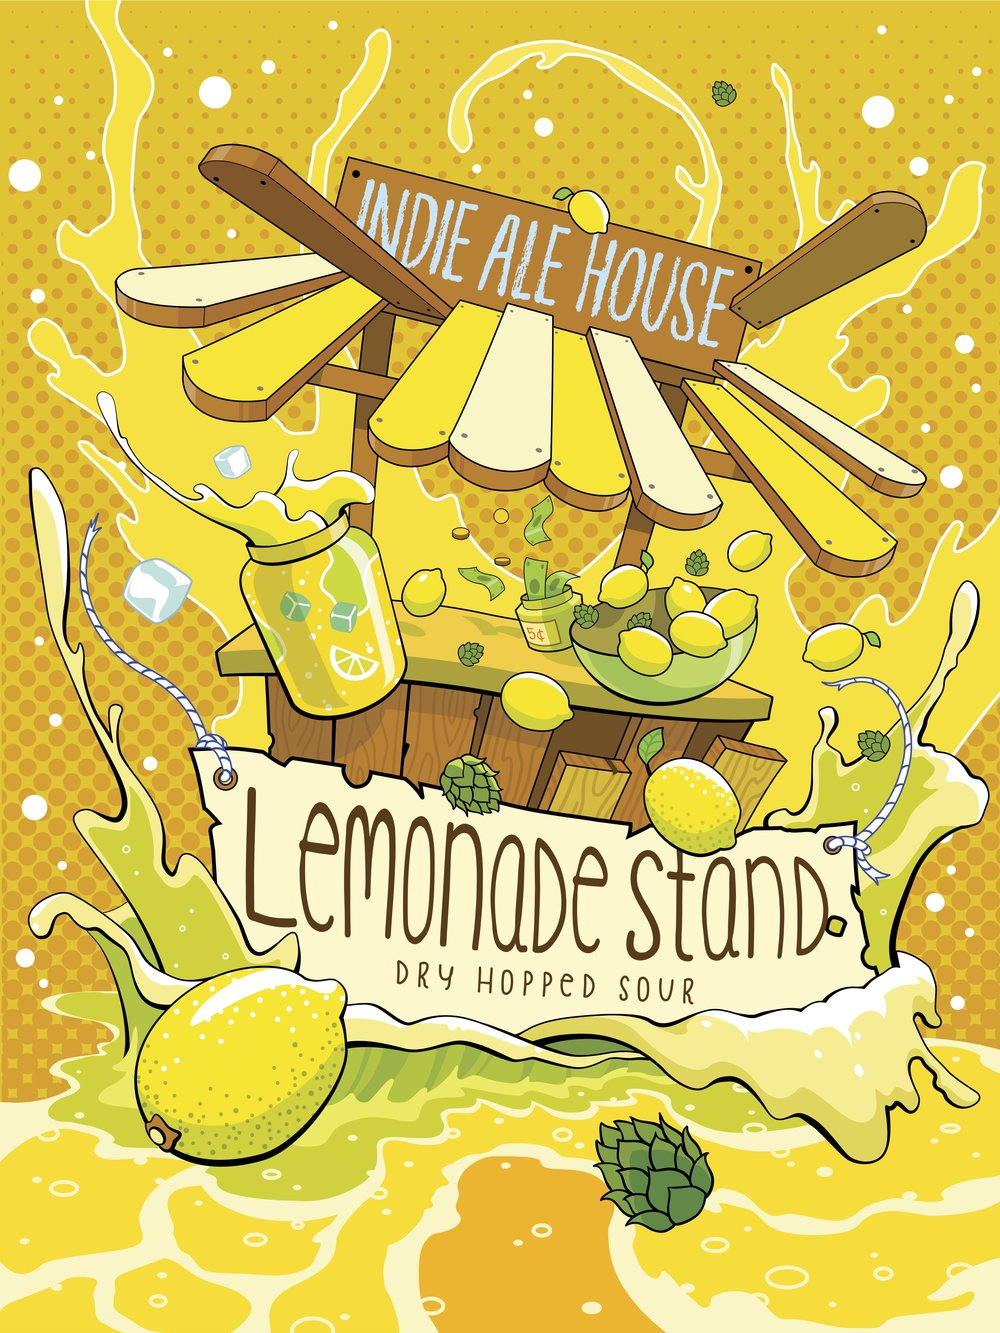 Lemon & Lactose Sour - Friday June 9th 12pm bottle release $6.50/500ml bottle + deposit